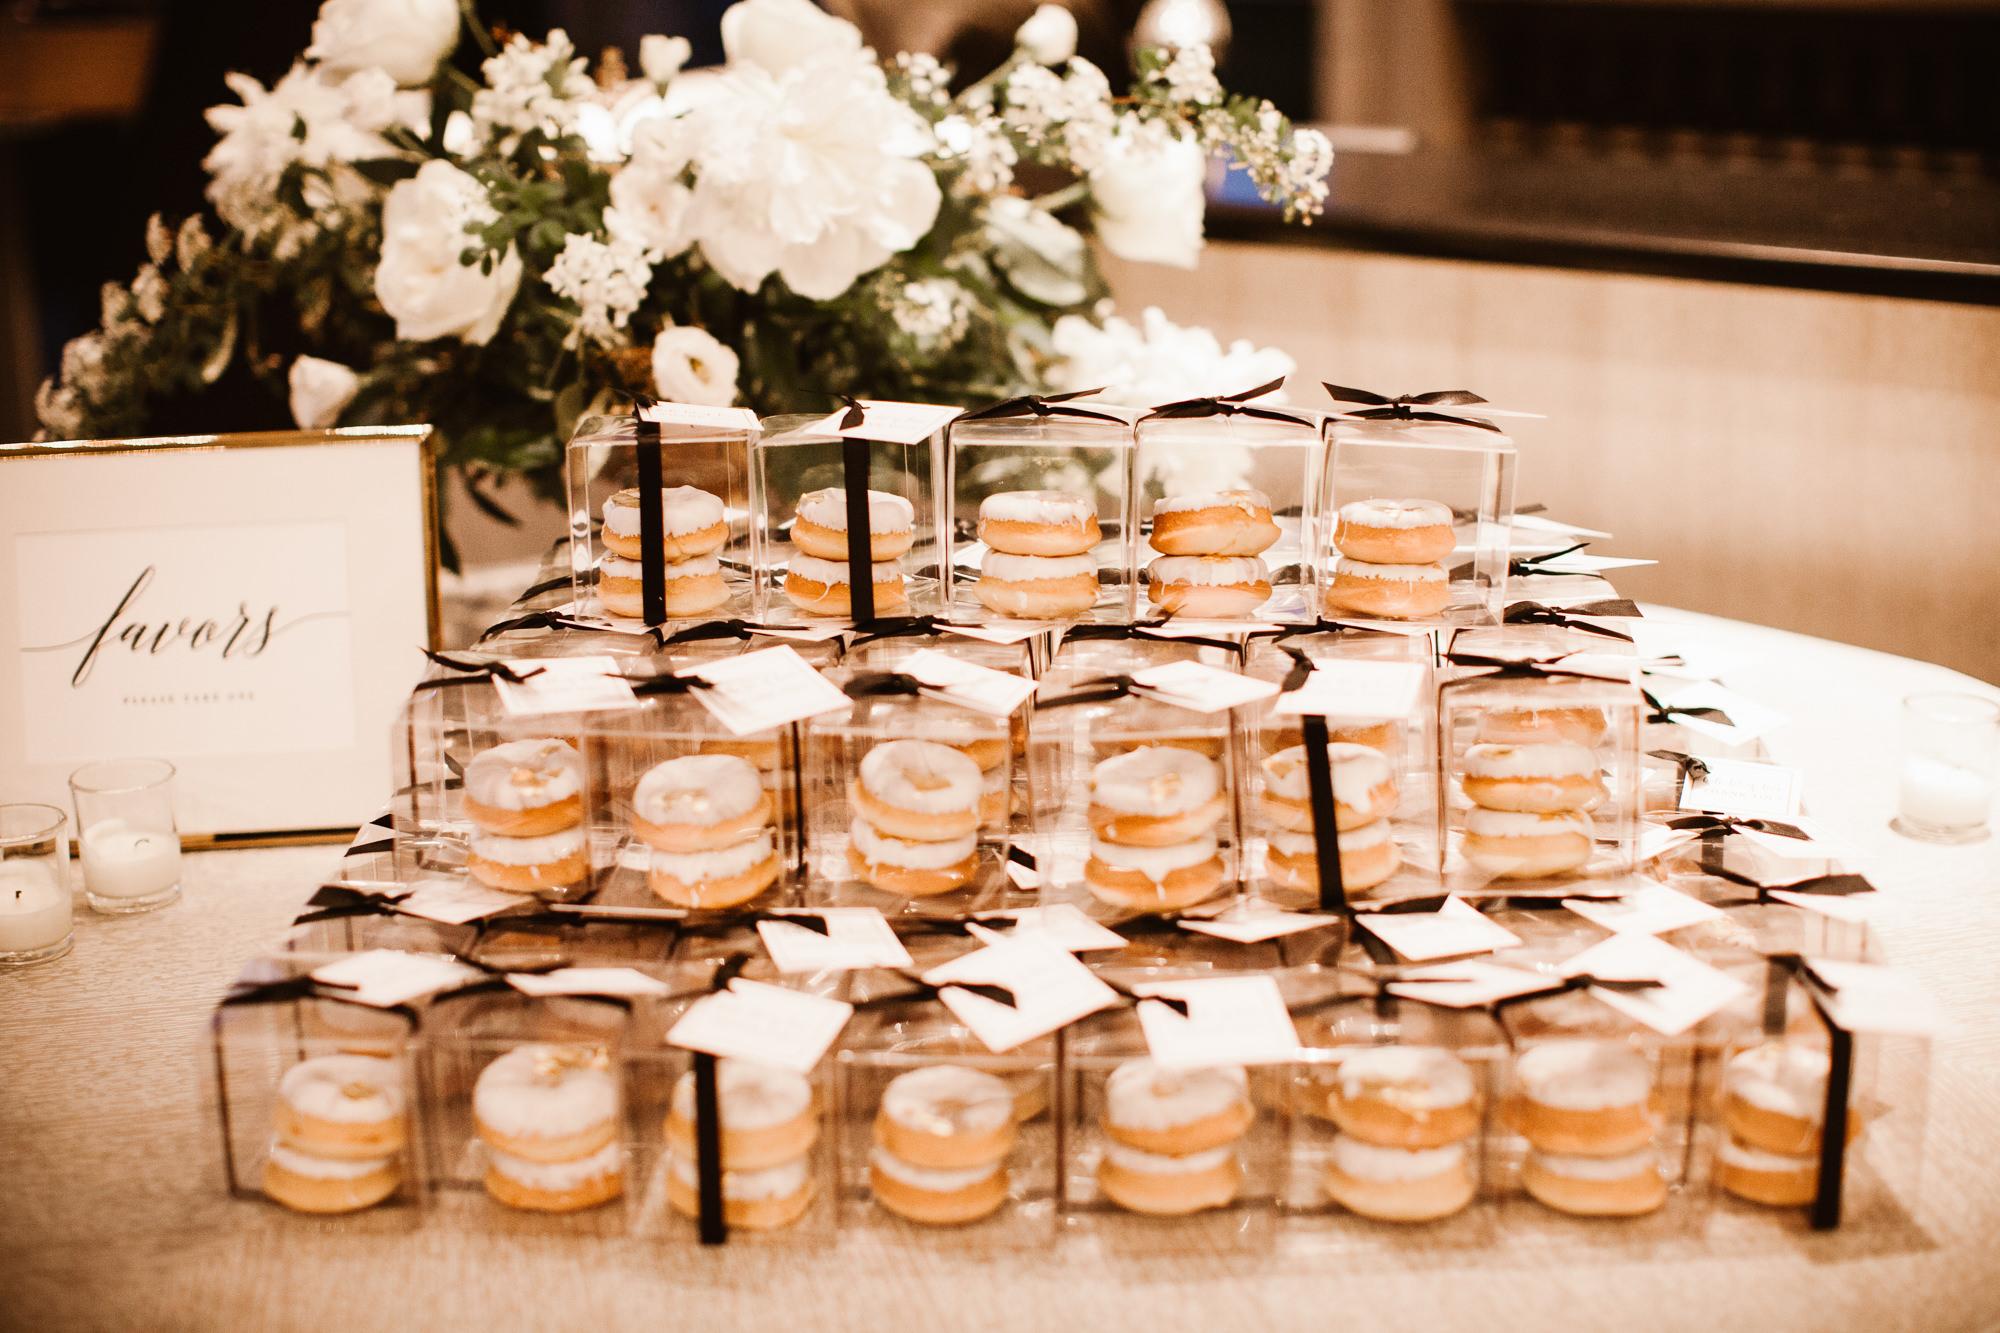 stratus-winery-wedding-vineyard-wedding-vineyard-bride-photo-by-reed-photography-051.jpg